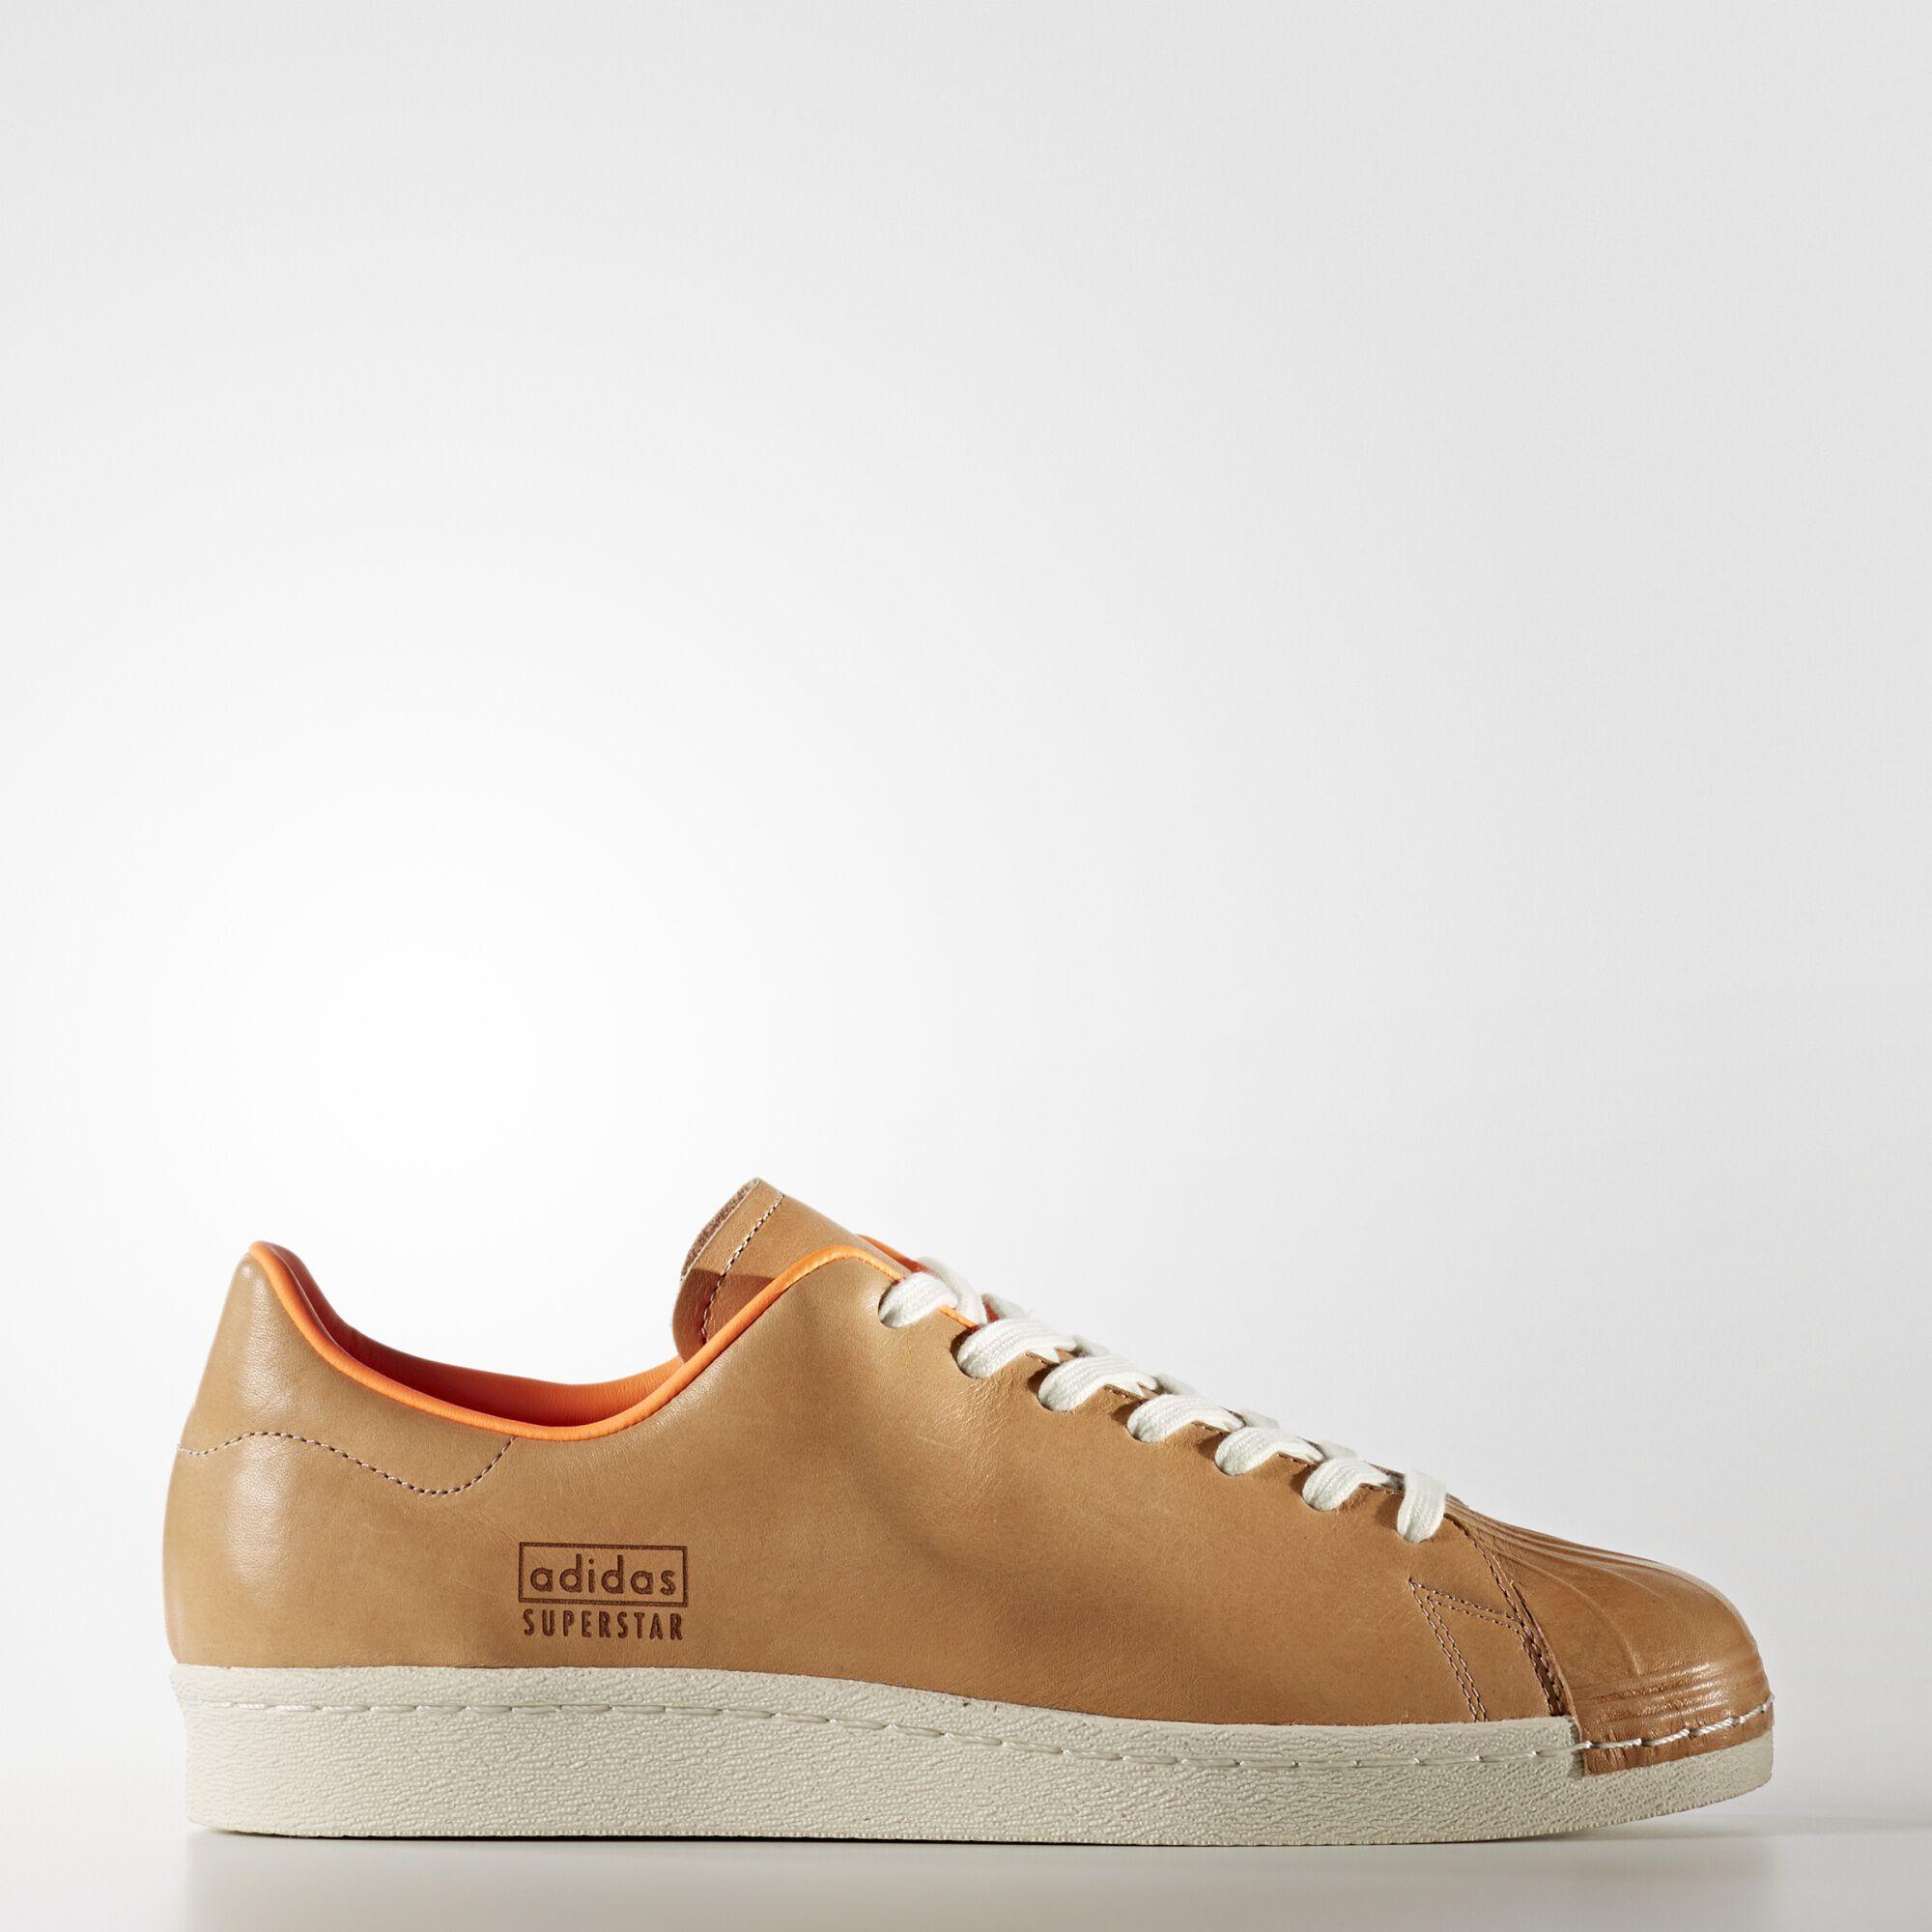 80s Superstar Adidas Limitata Edizione Trollbeads UMpVqzSGL